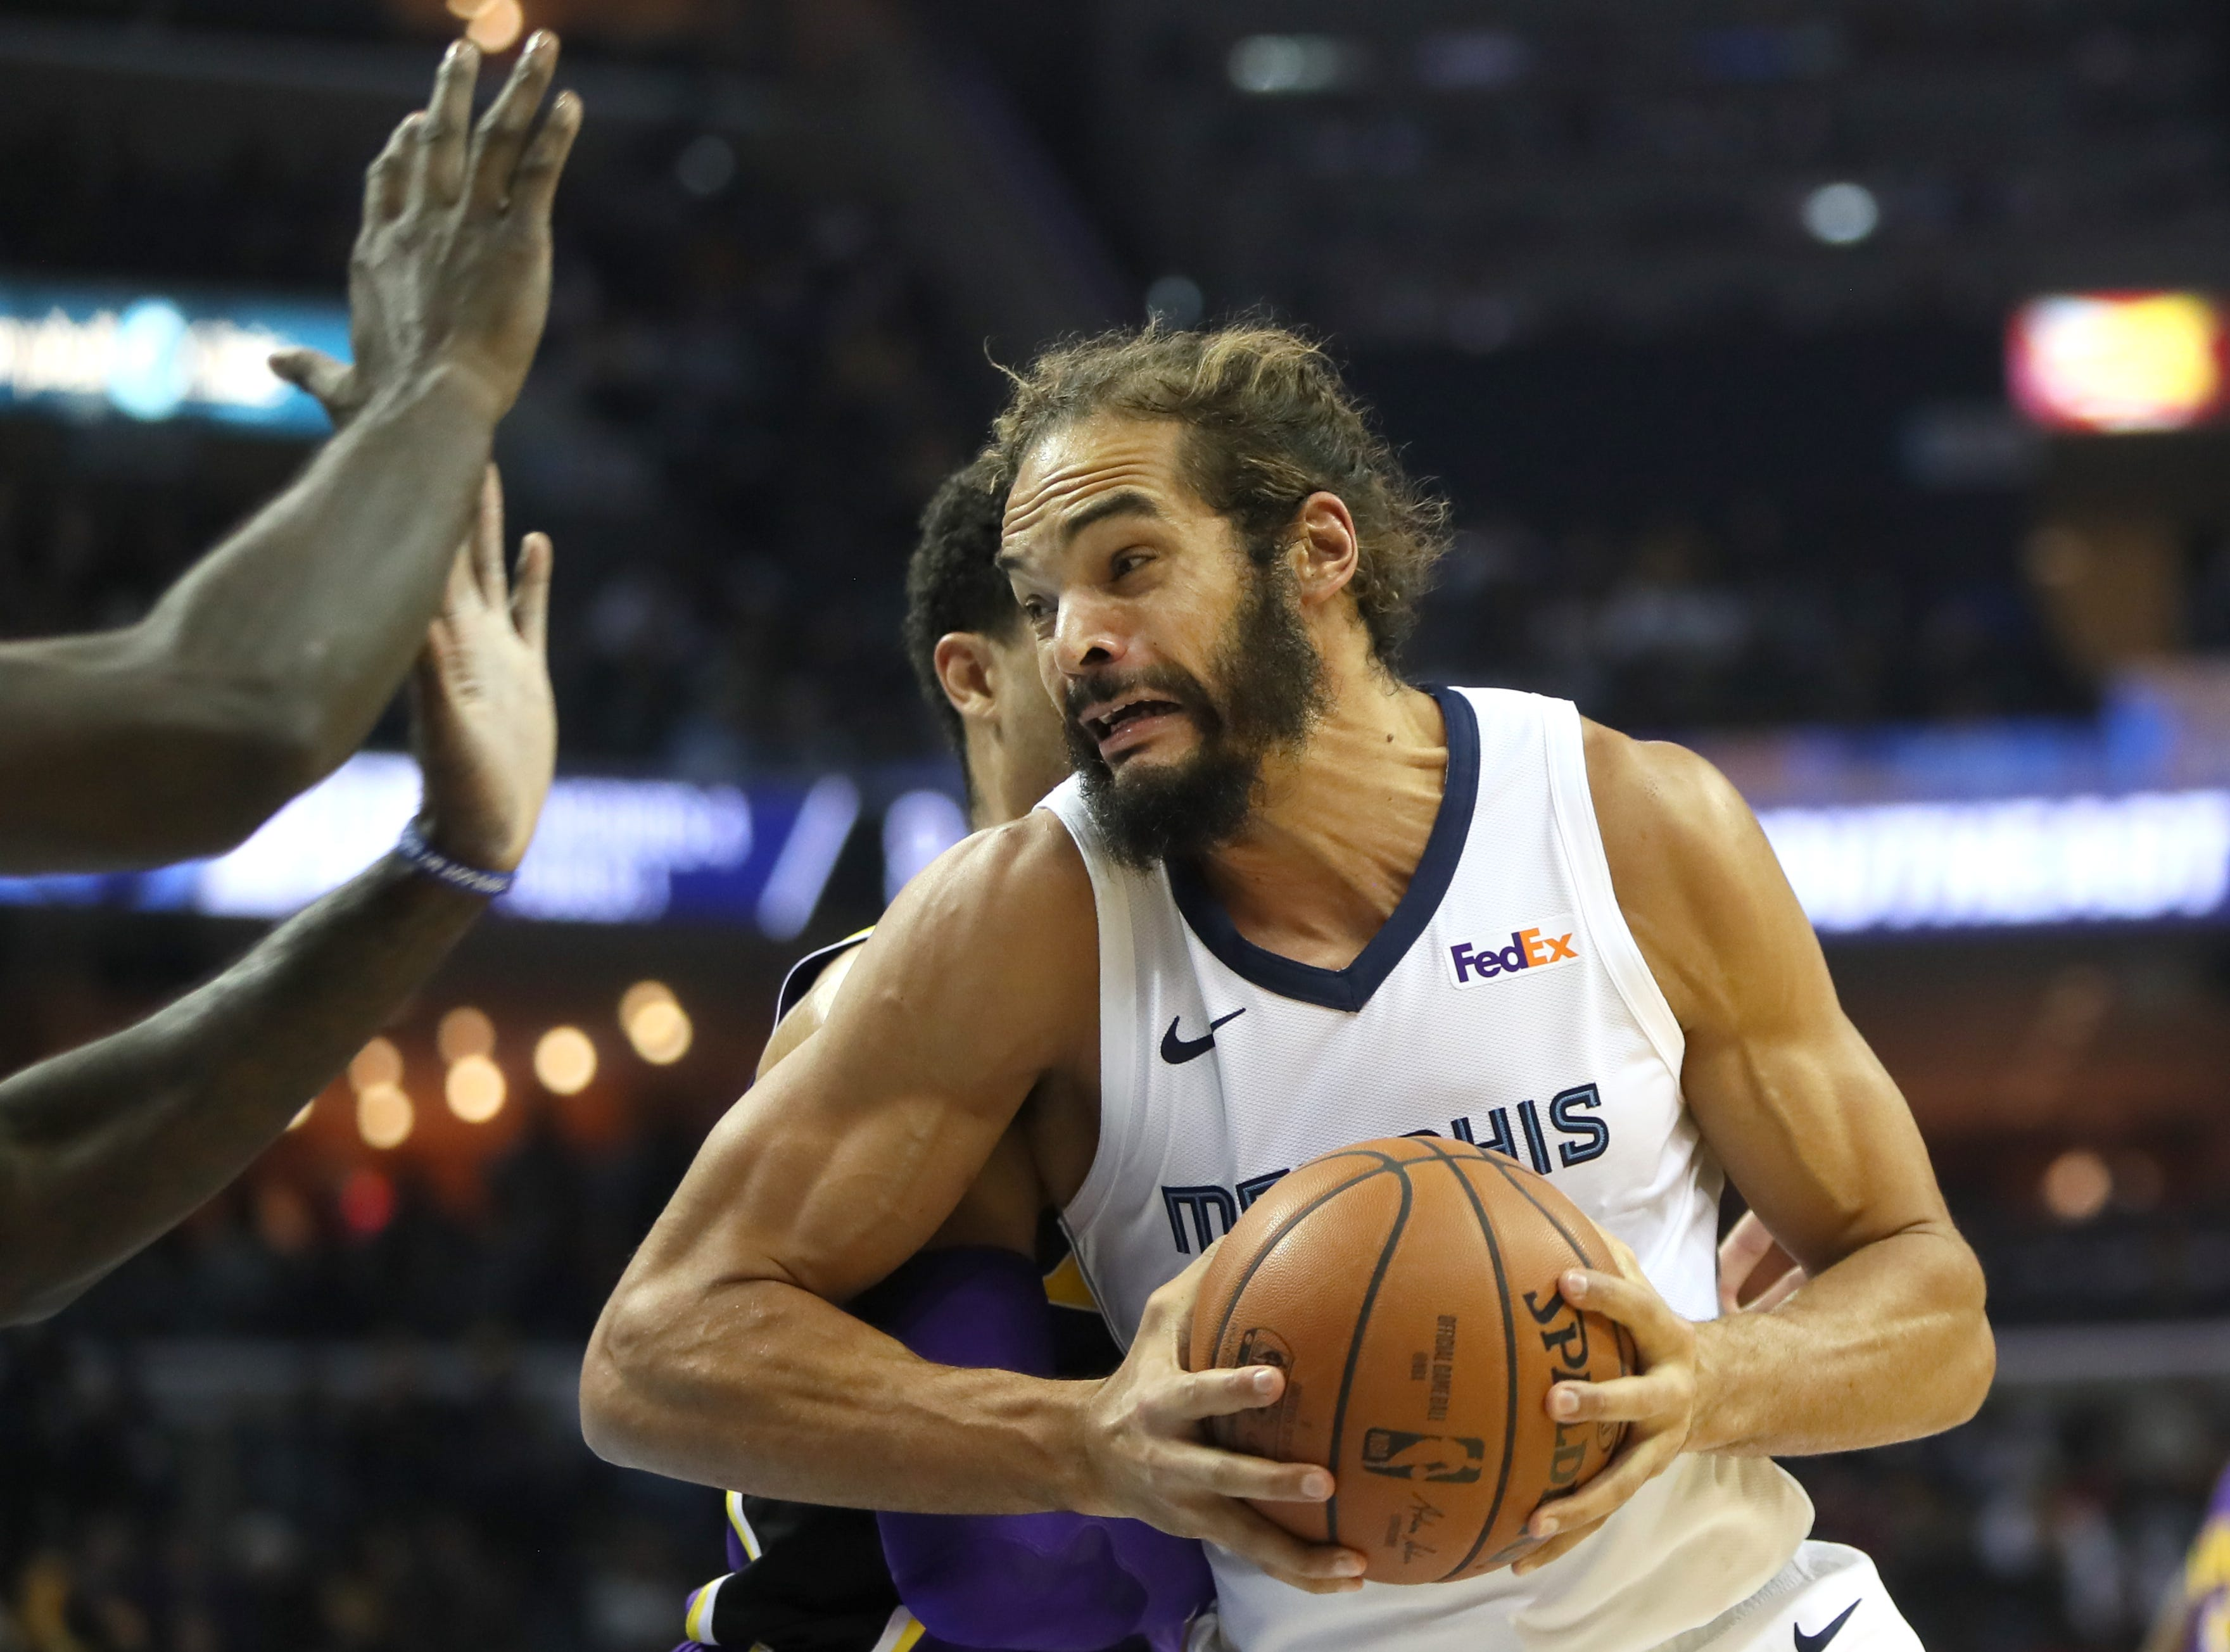 Memphis Grizzlies forward Joakim Noah tries to spin past Los Angeles Lakers defenders at the FedExForum on Saturday, Dec. 6, 2018.